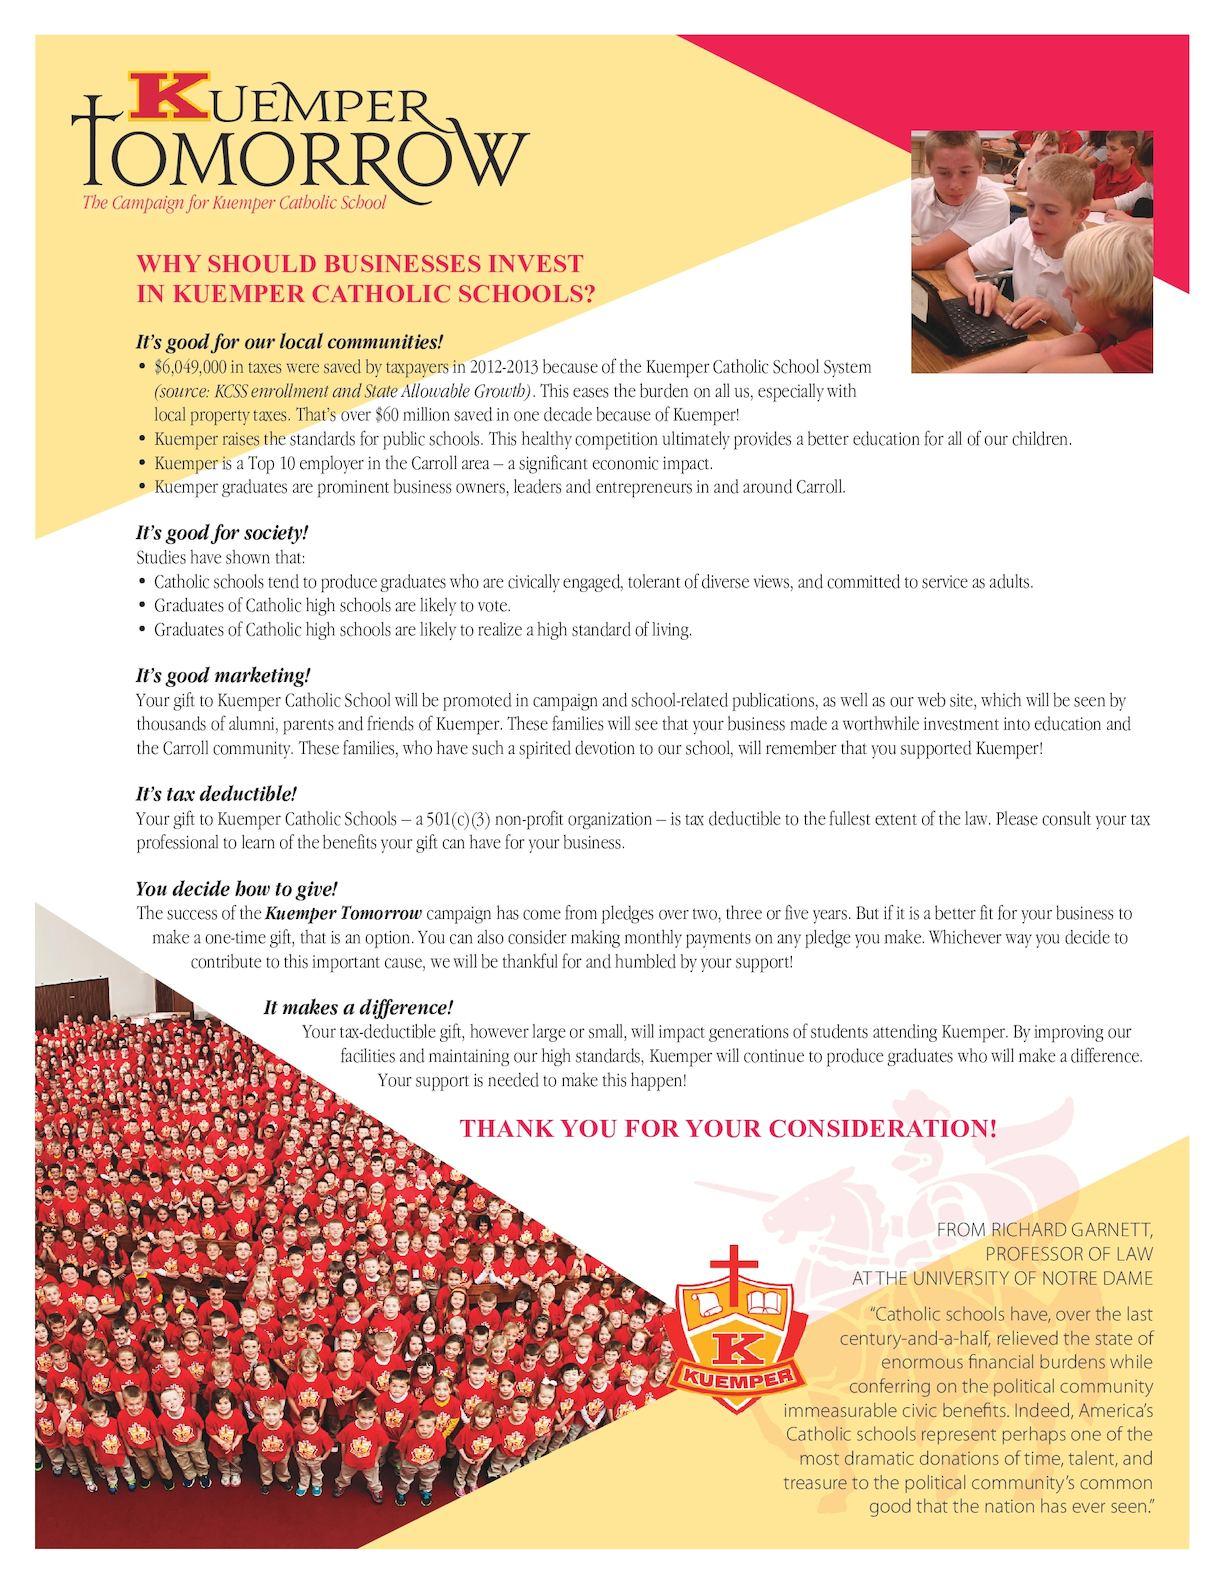 Calaméo - Kuemper Catholic Business Appeal